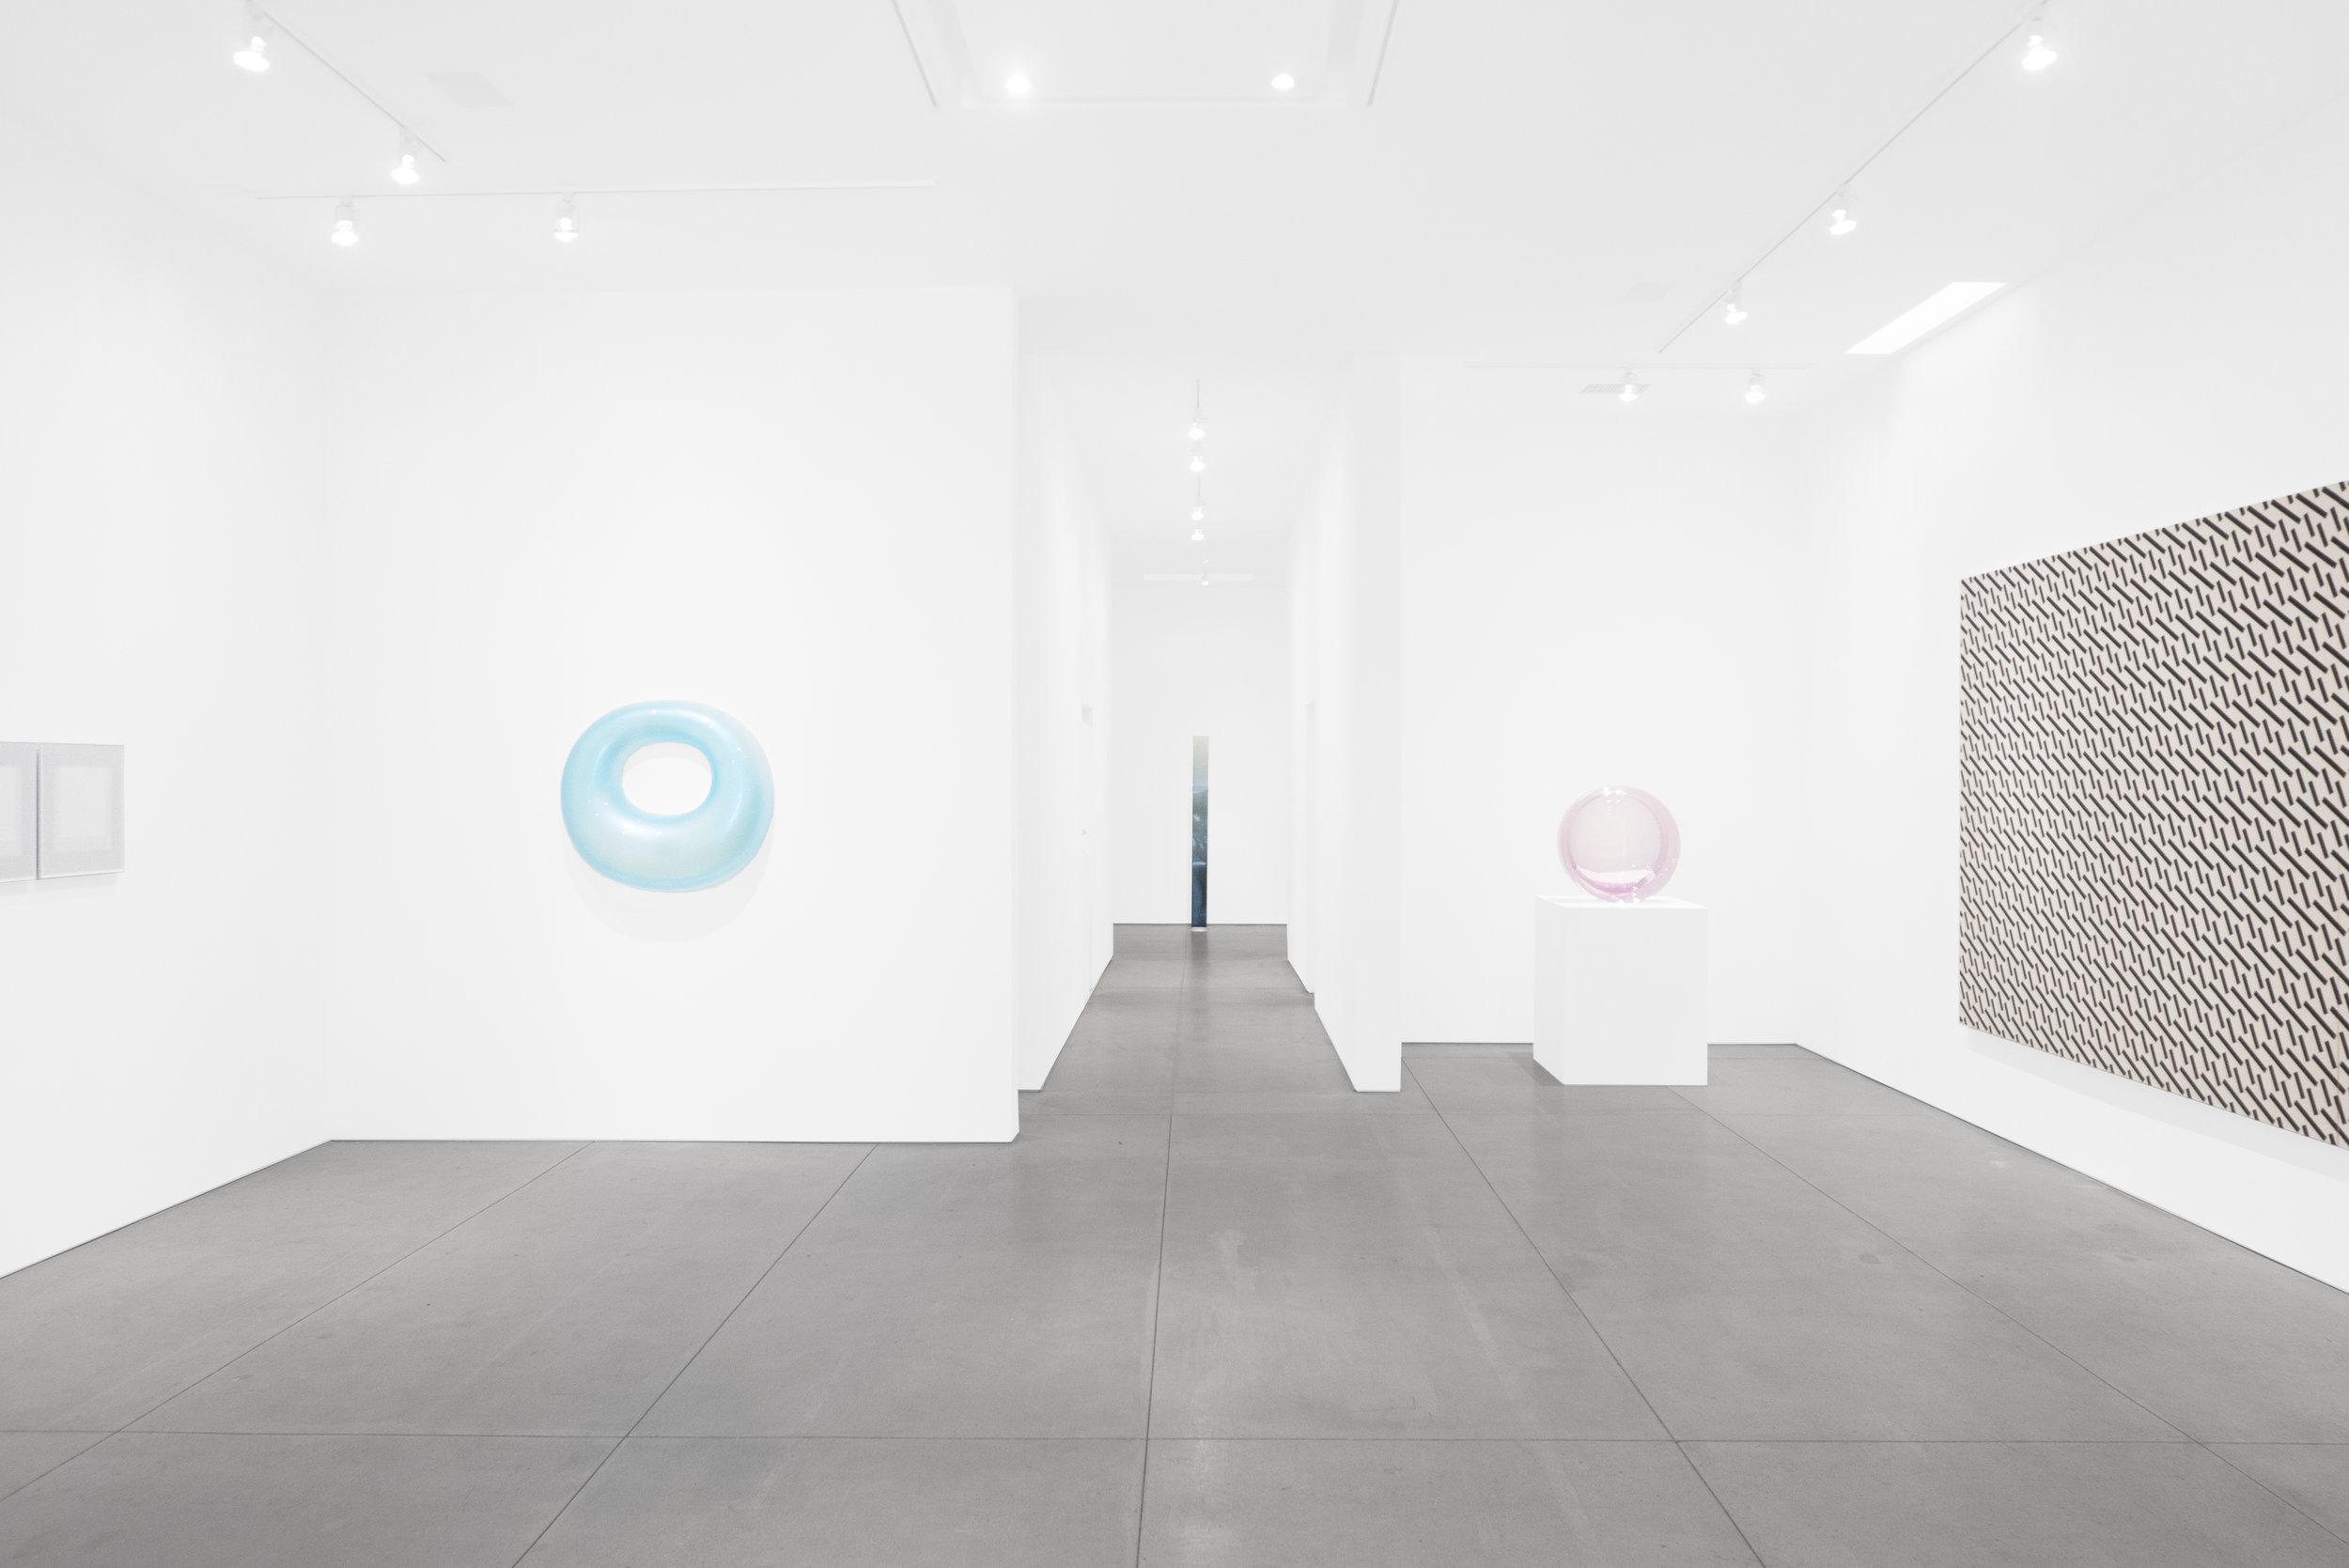 25 Years_Peter Blake Gallery_2019_Installation View_13.jpg